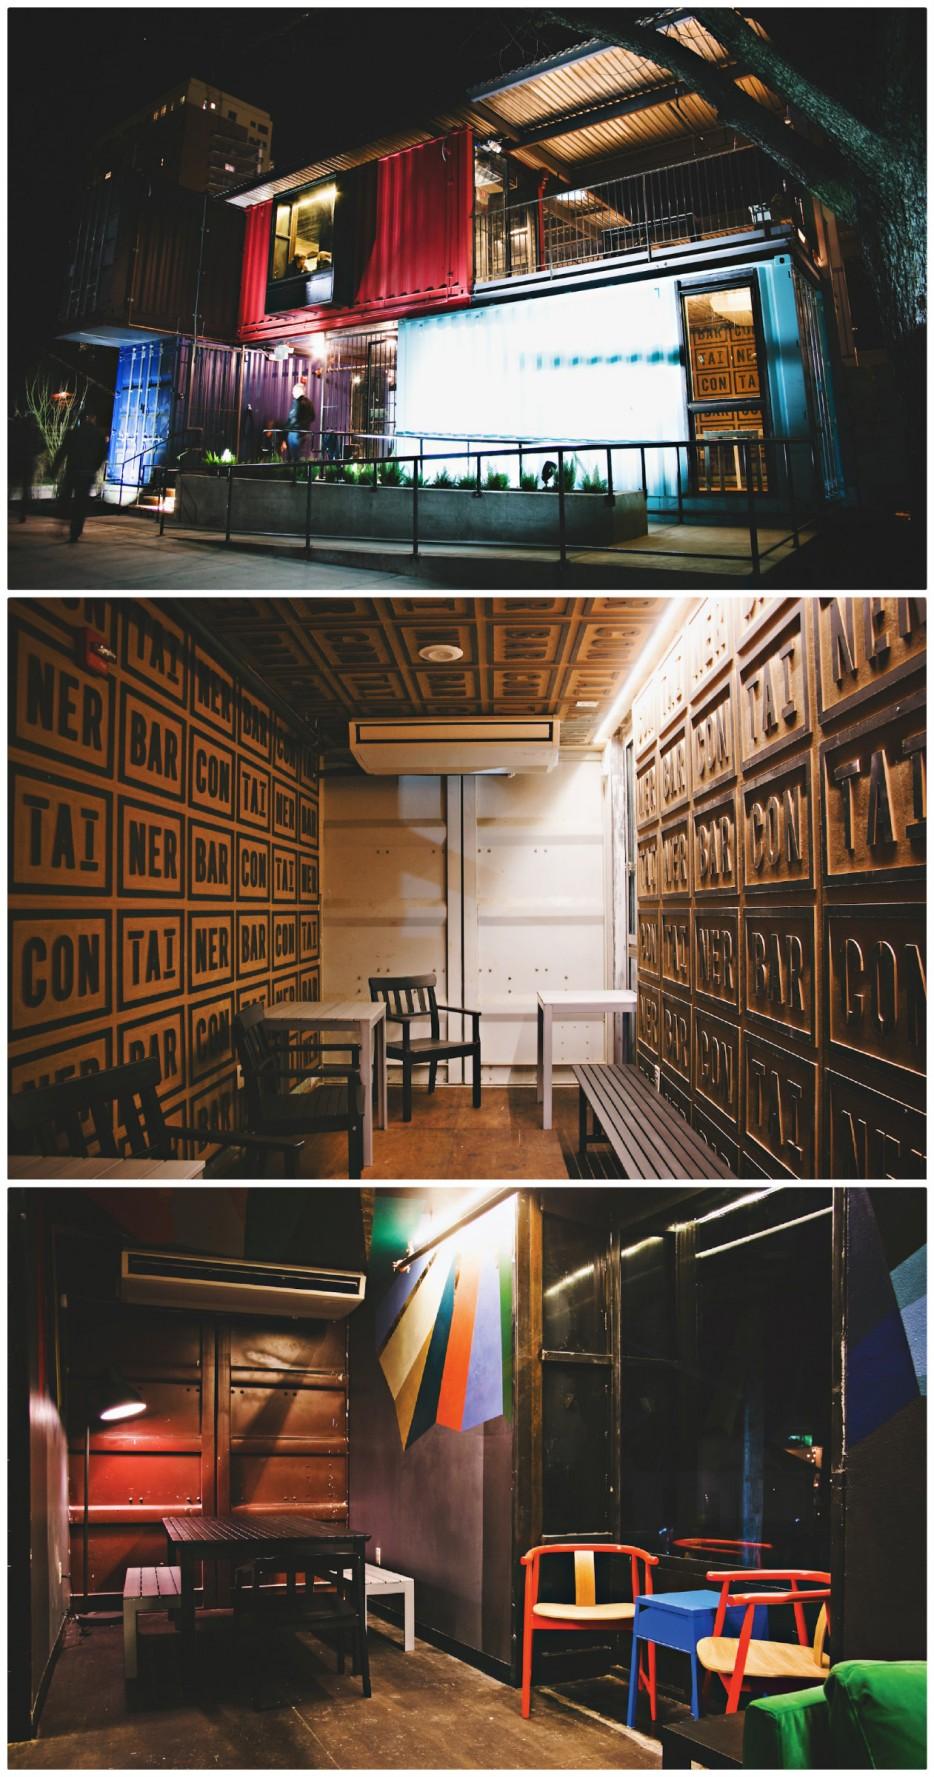 1. 貨櫃酒吧(Container Bar):美國奧斯丁(Austin)